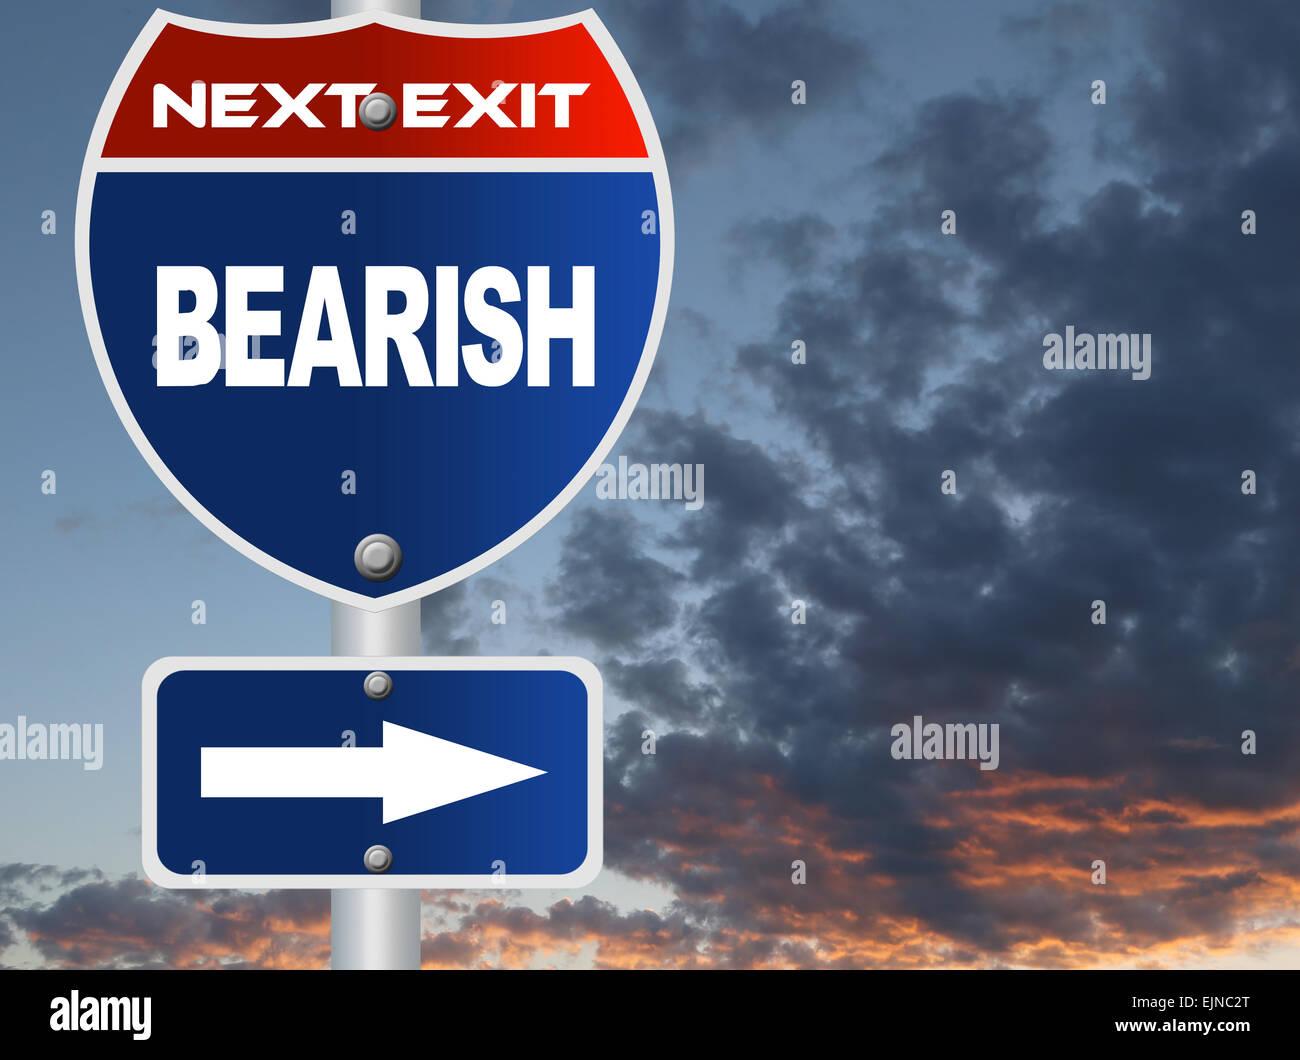 Bearish road sign - Stock Image